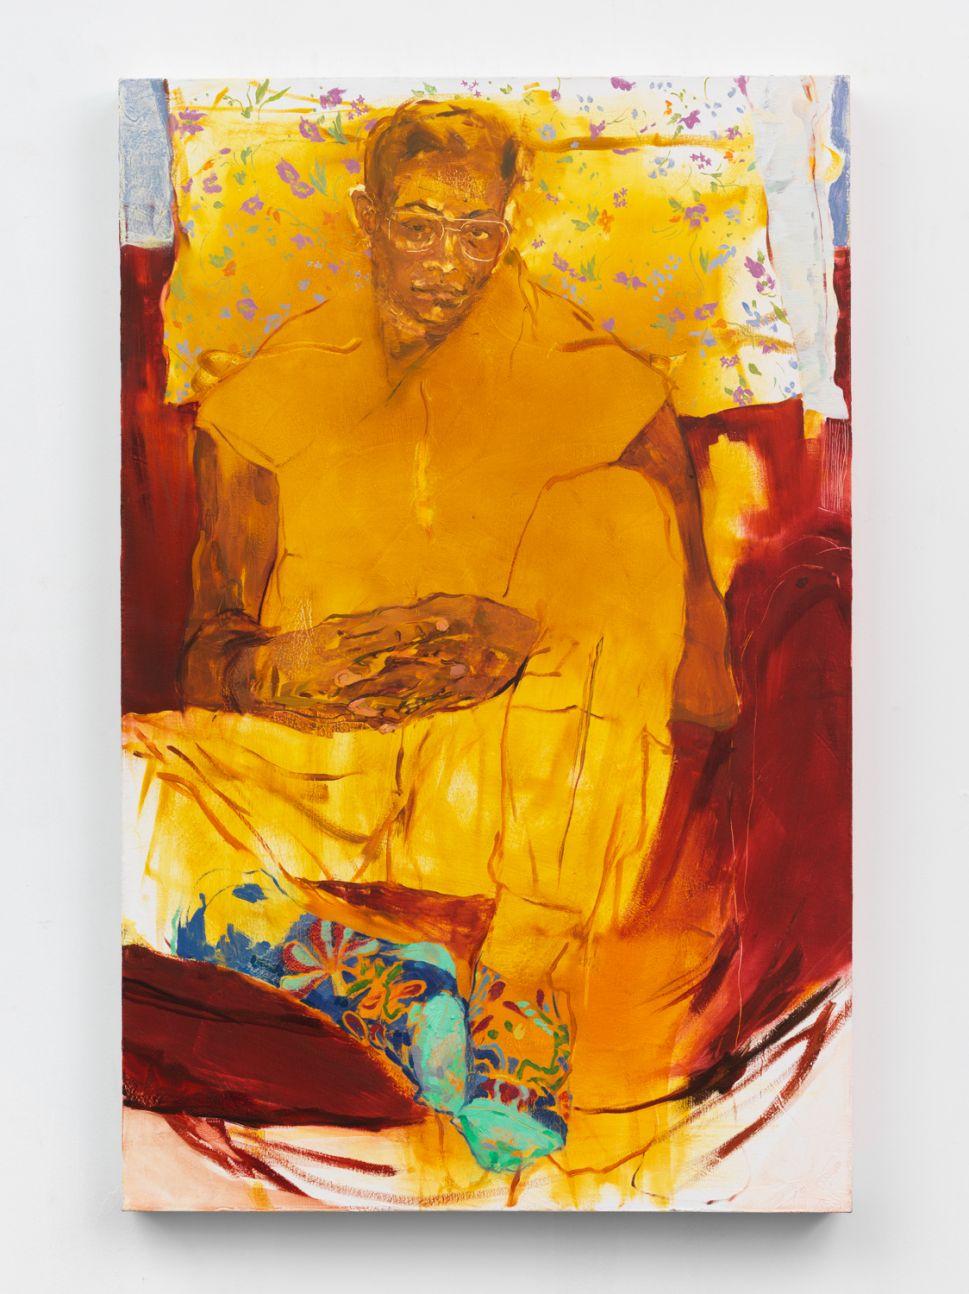 Jennifer Packer on Painting the Vulnerability of the Black Female Body